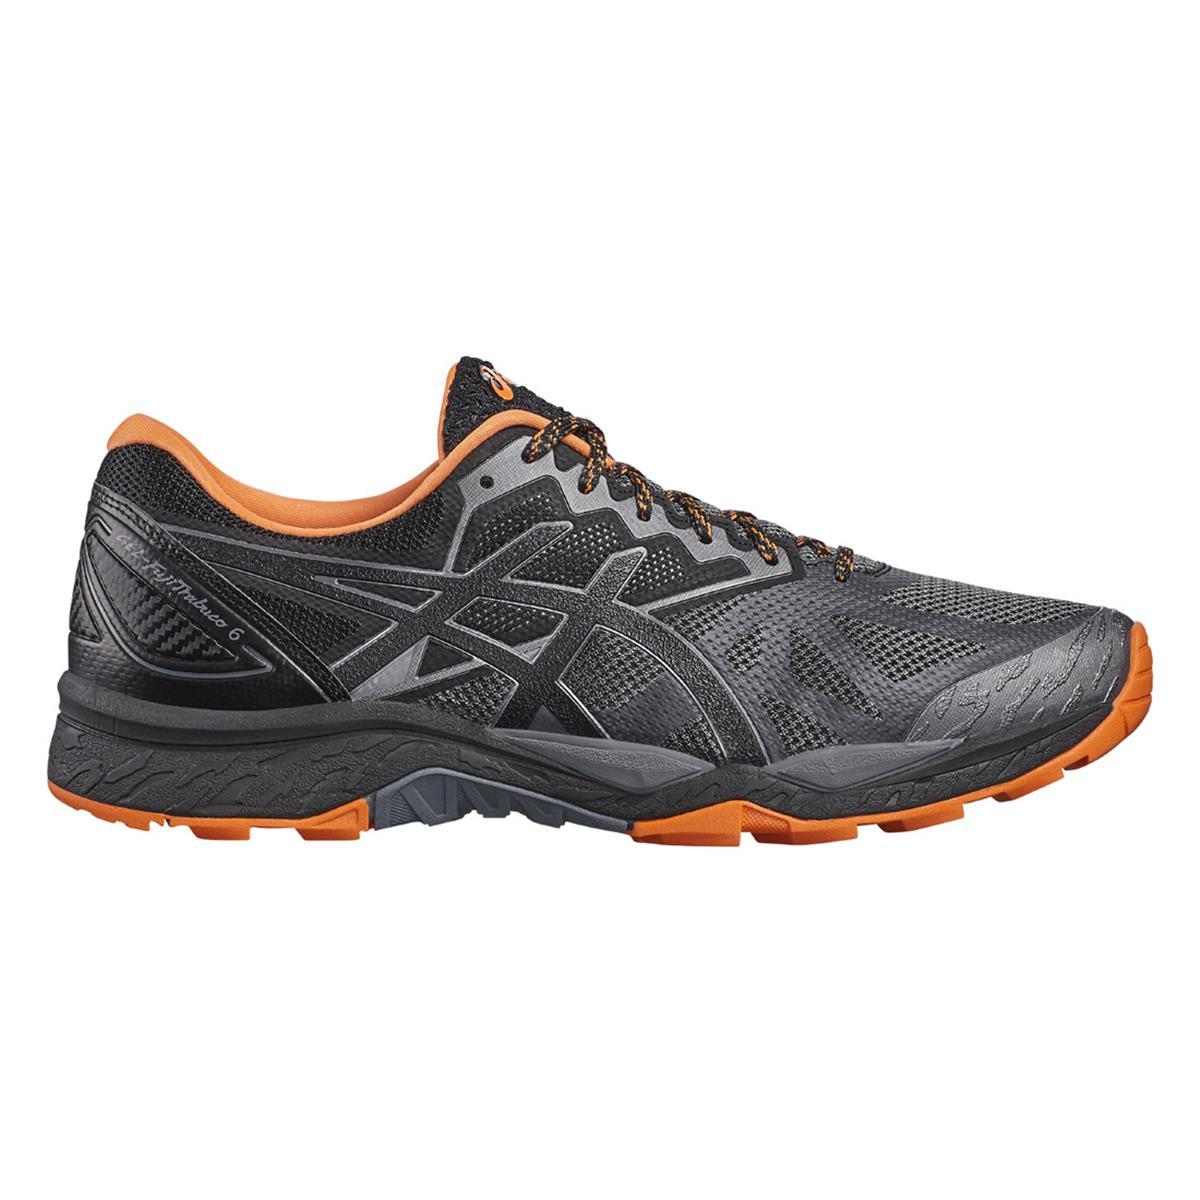 a030a34e2286 Asics Gel Fuji Trabuco 6 Mens Trail Running Shoes (Carbon)